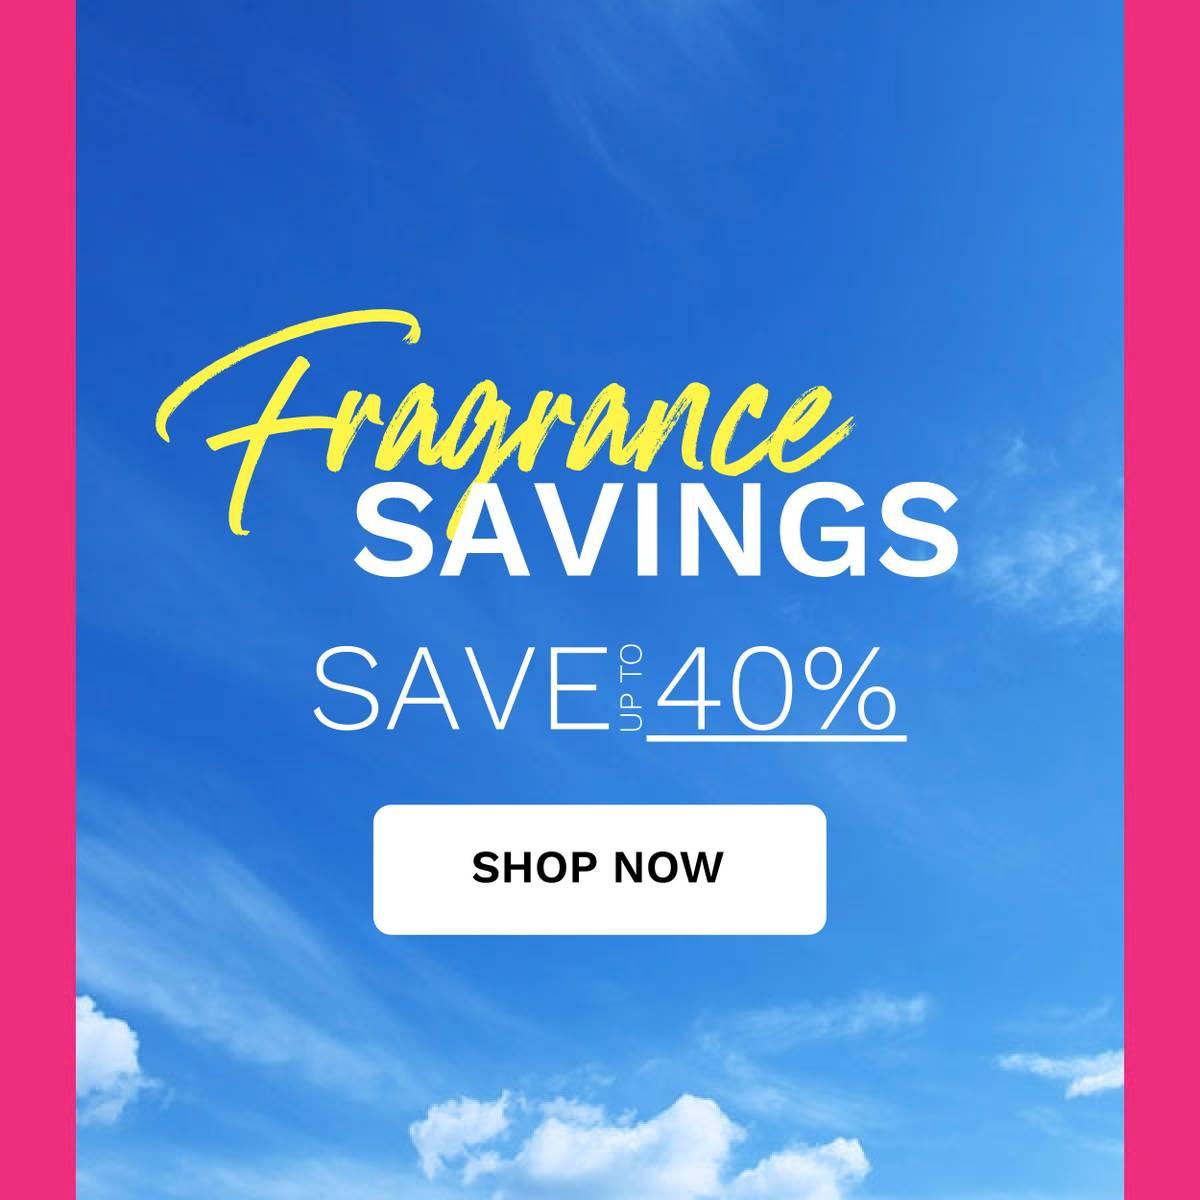 Fragrance 30% savings